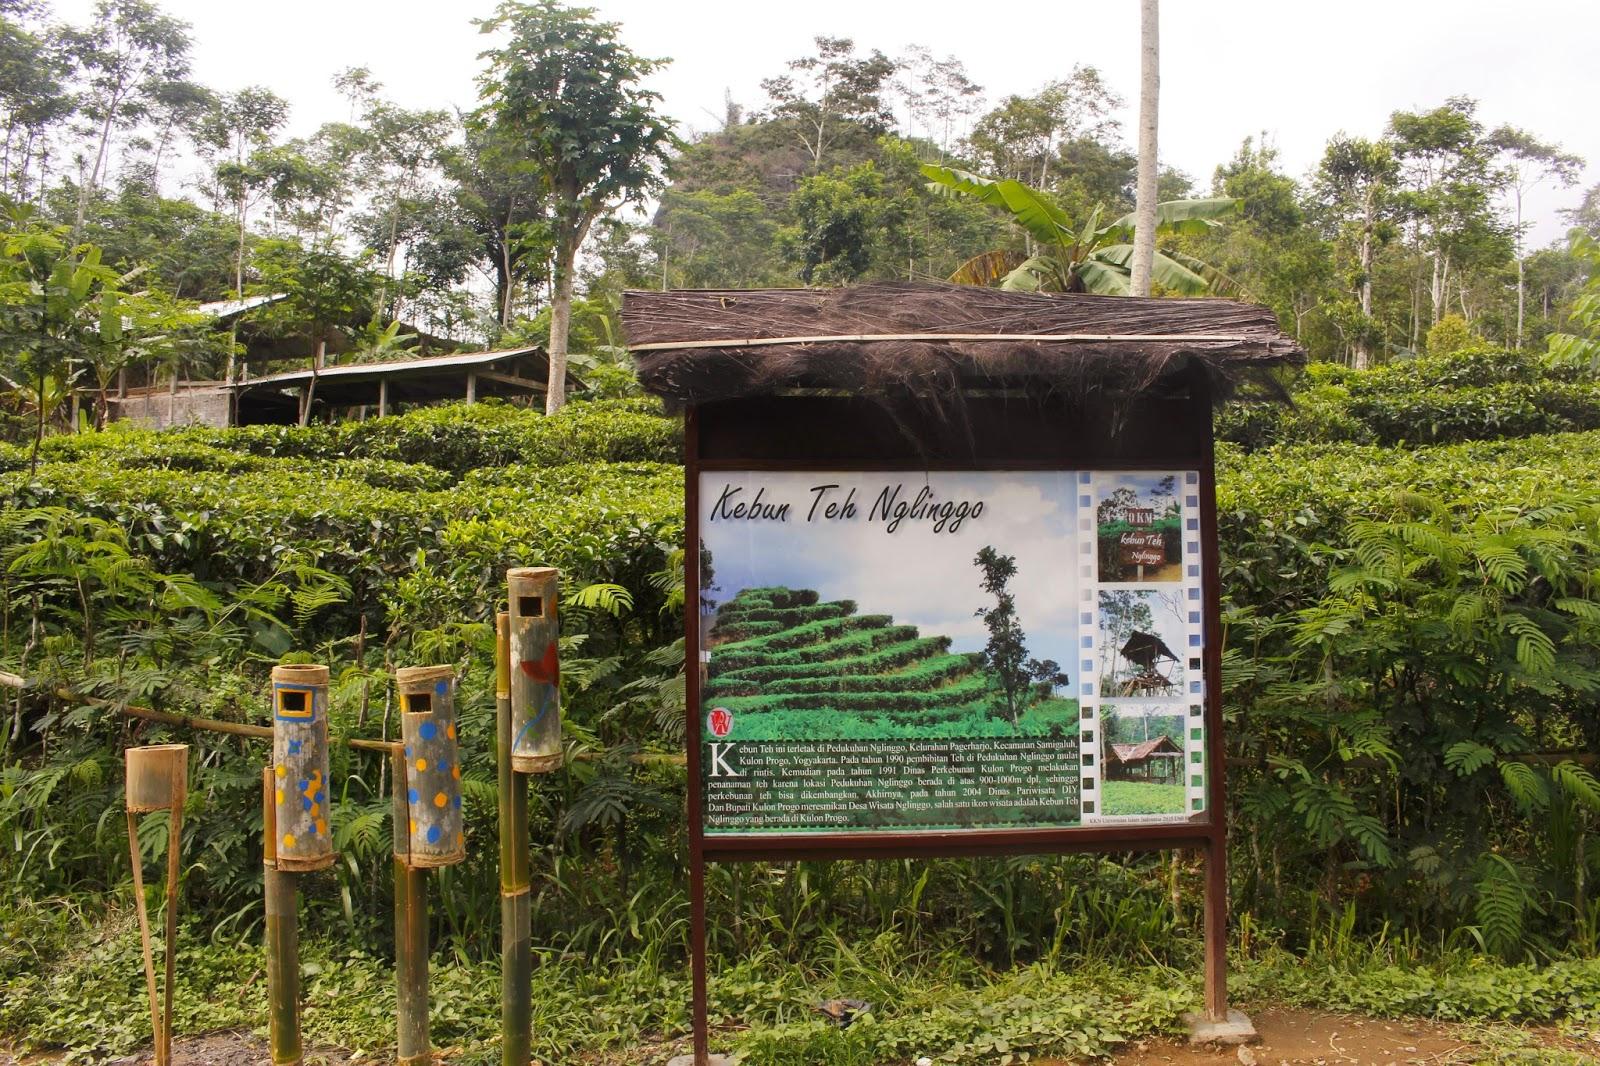 Wisata Kebun Teh Nglinggo Samigaluh Kulon Progo Yogyakarta Kota